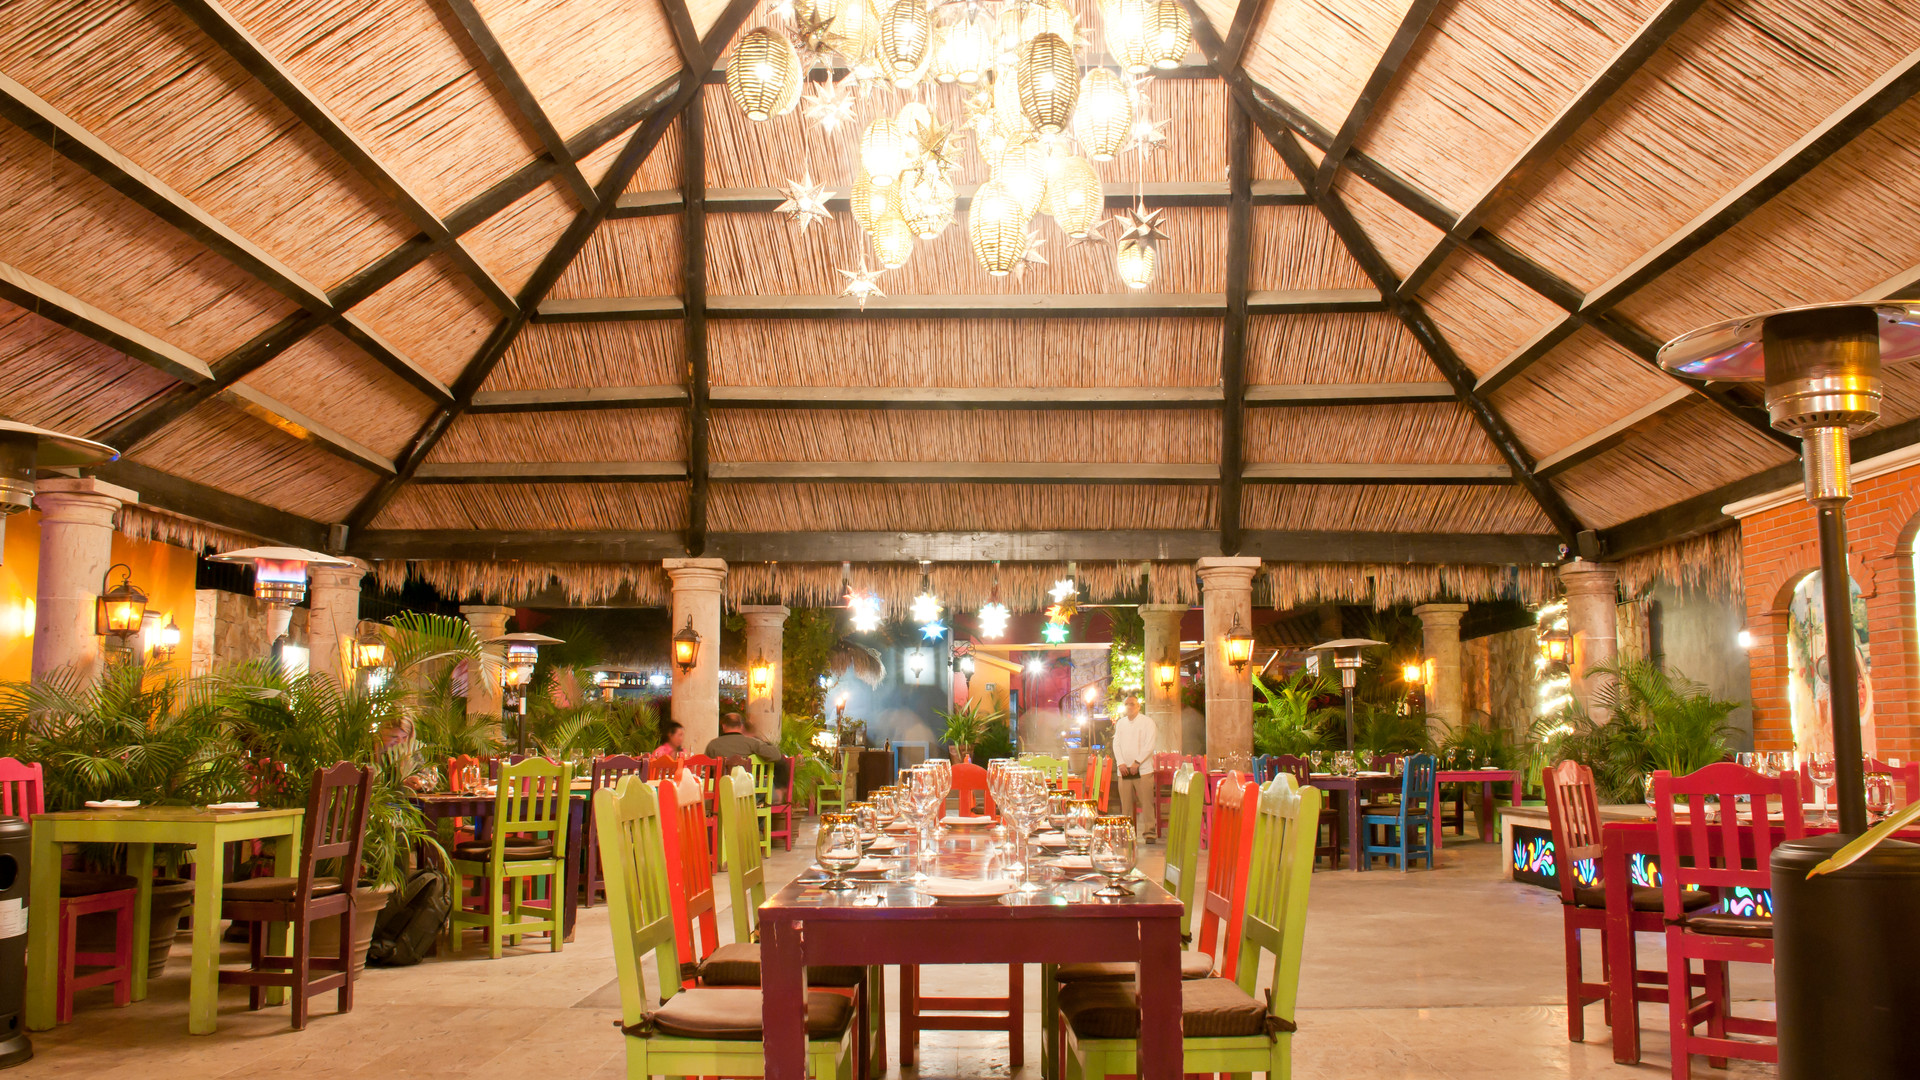 Don_Sánchez_Restaurant_Courtyard1.jpg